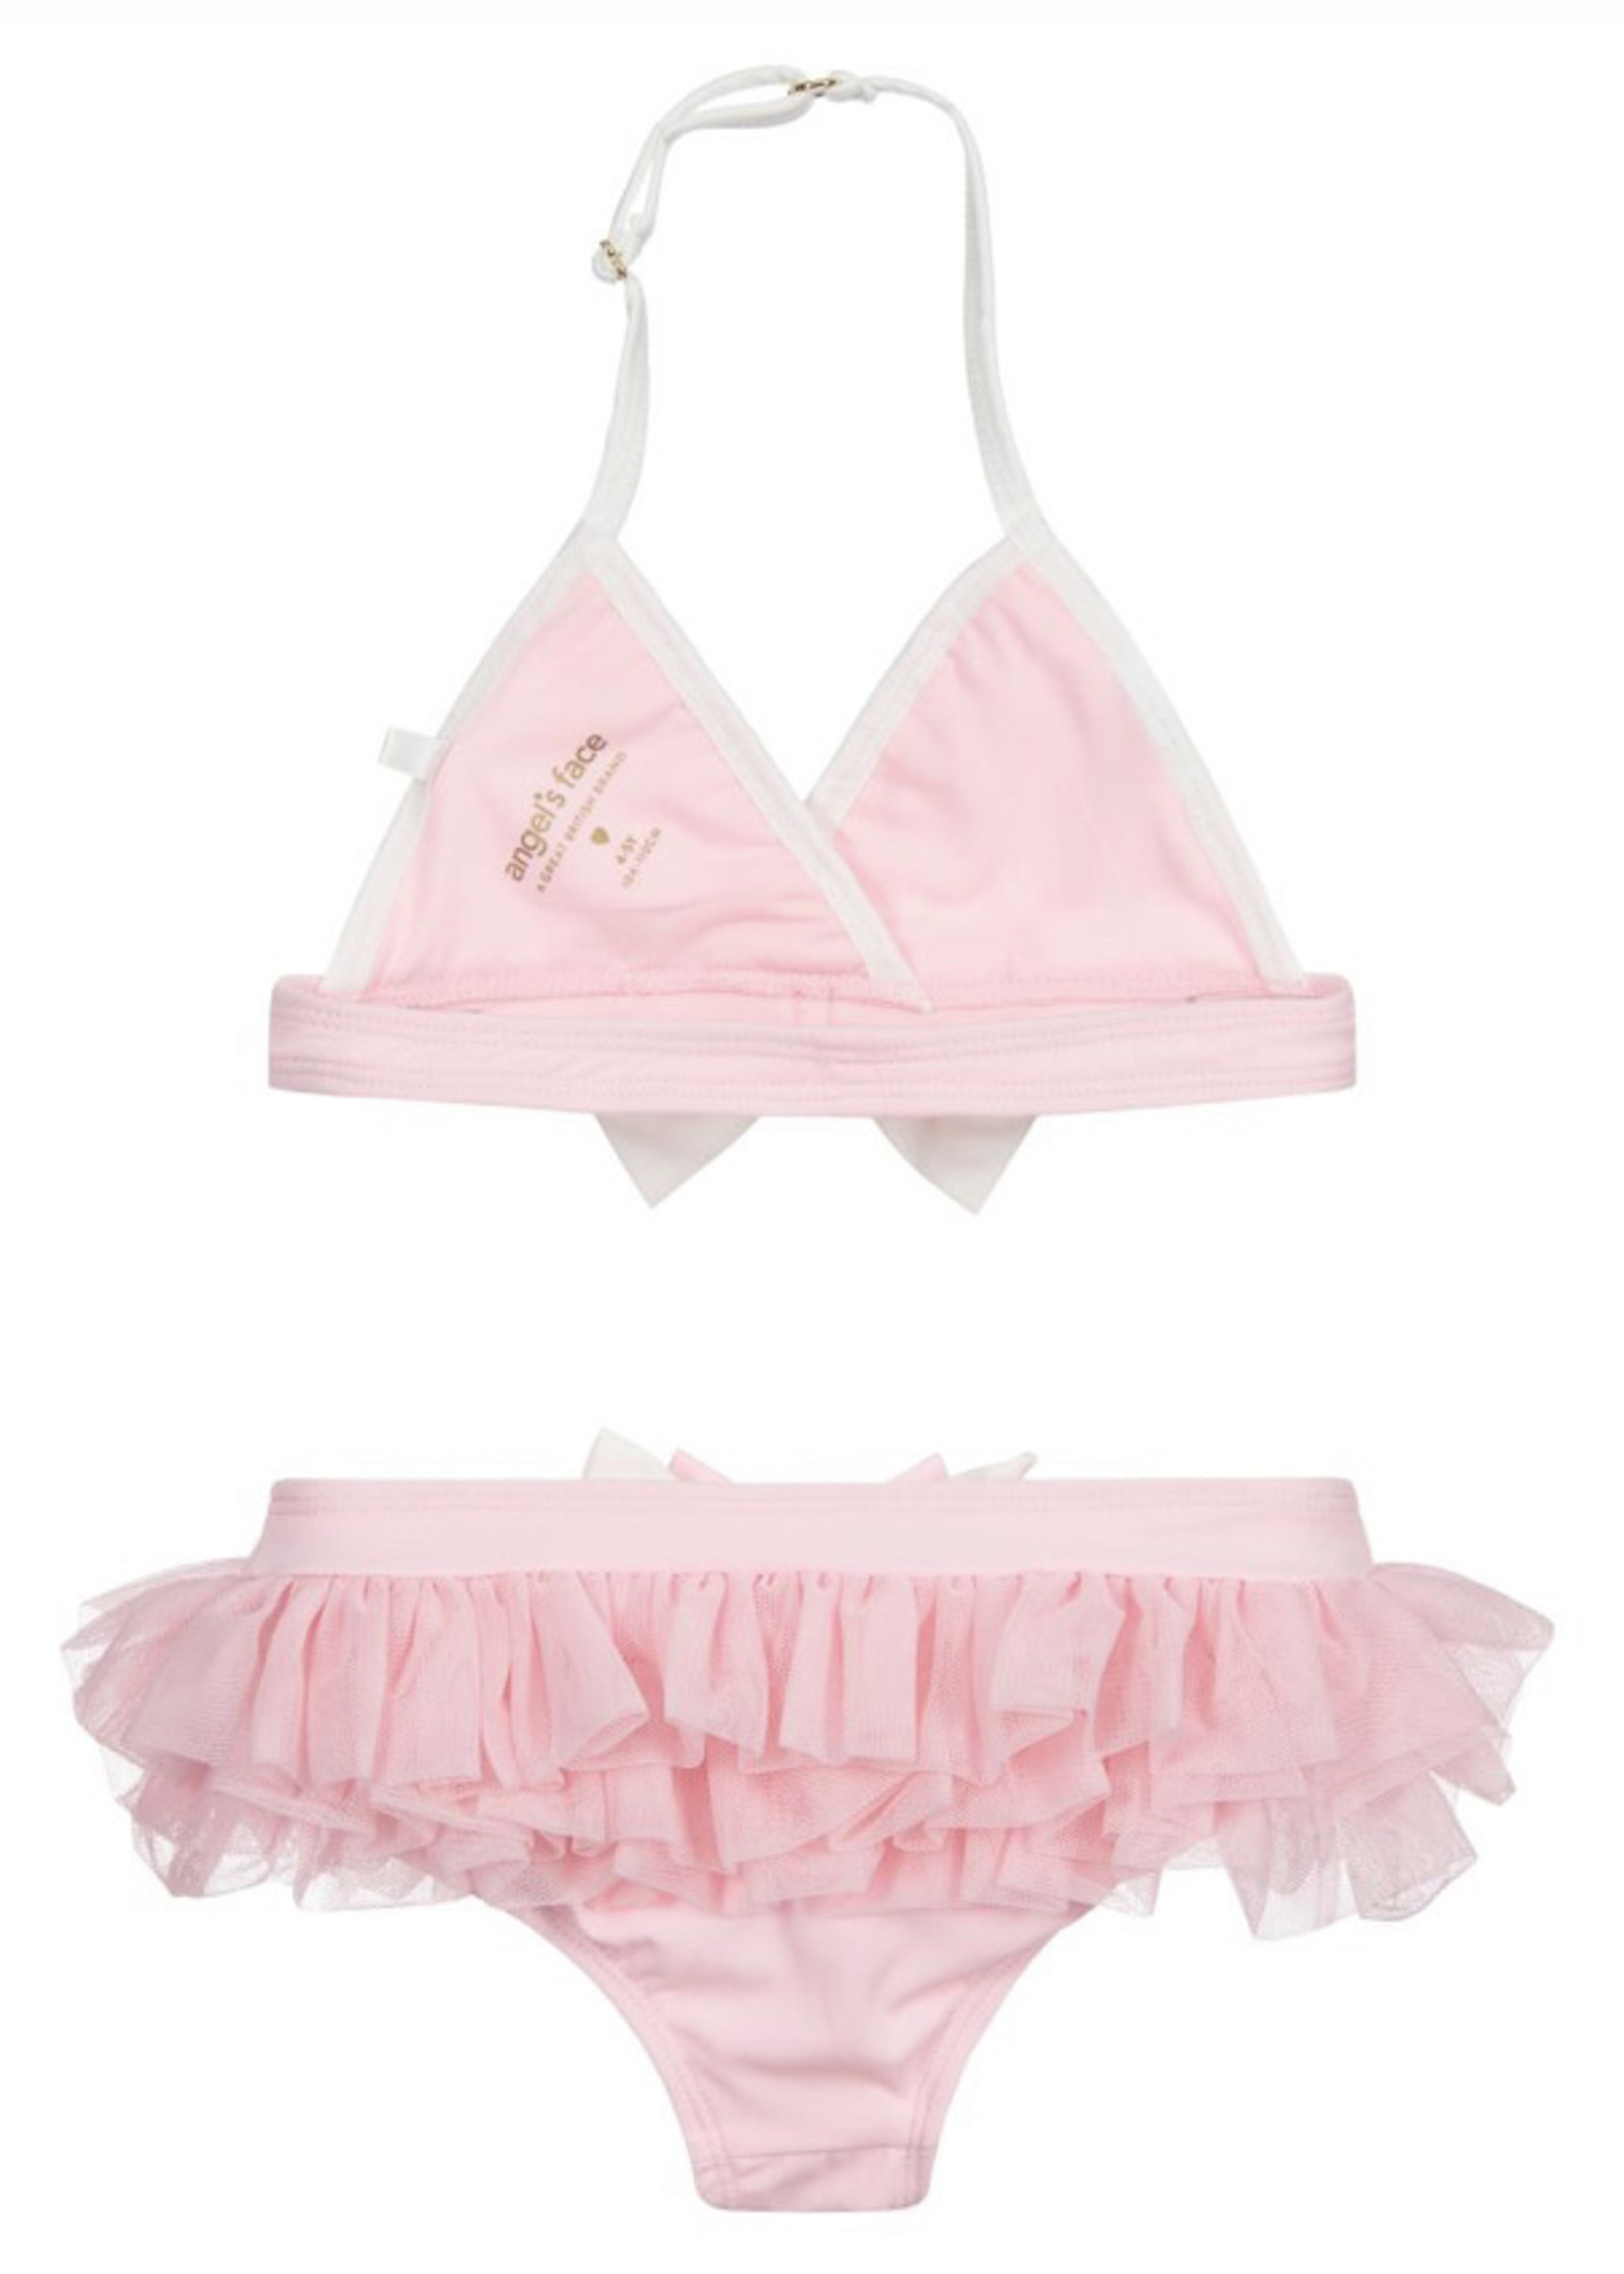 Angels Face Angels Face Adel Rose pink